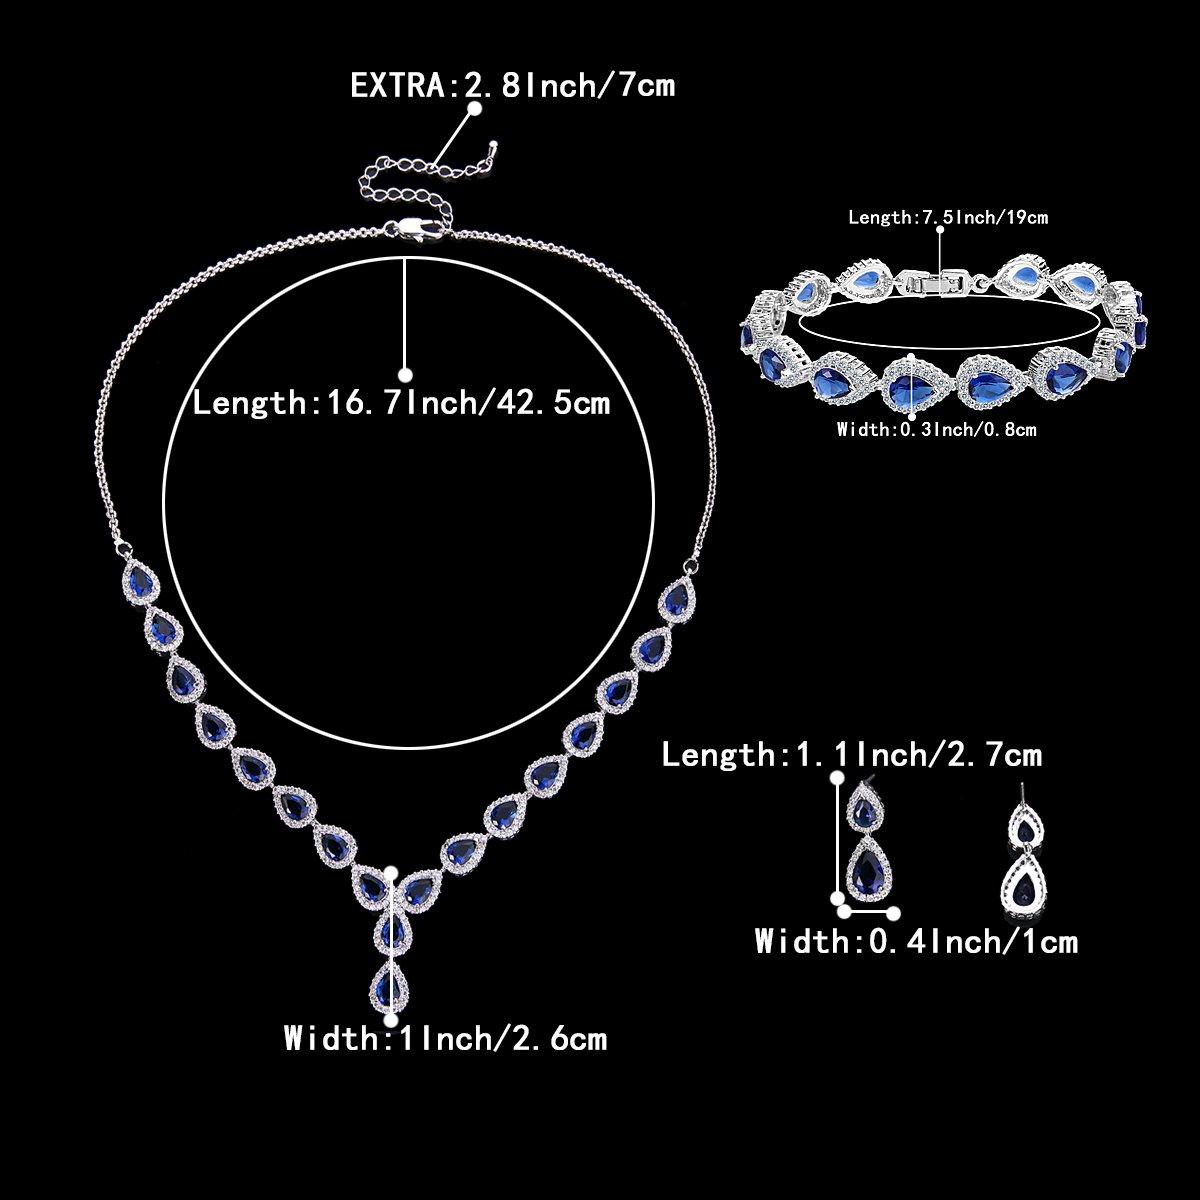 BriLove Women's Wedding Bridal Jewelry Set Y-Necklace Tennis Bracelet Dangle Earrings Set with Teardrop CZ Infinity Figure 8 Sapphire Color Silver-Tone September Birthstone by BriLove (Image #5)